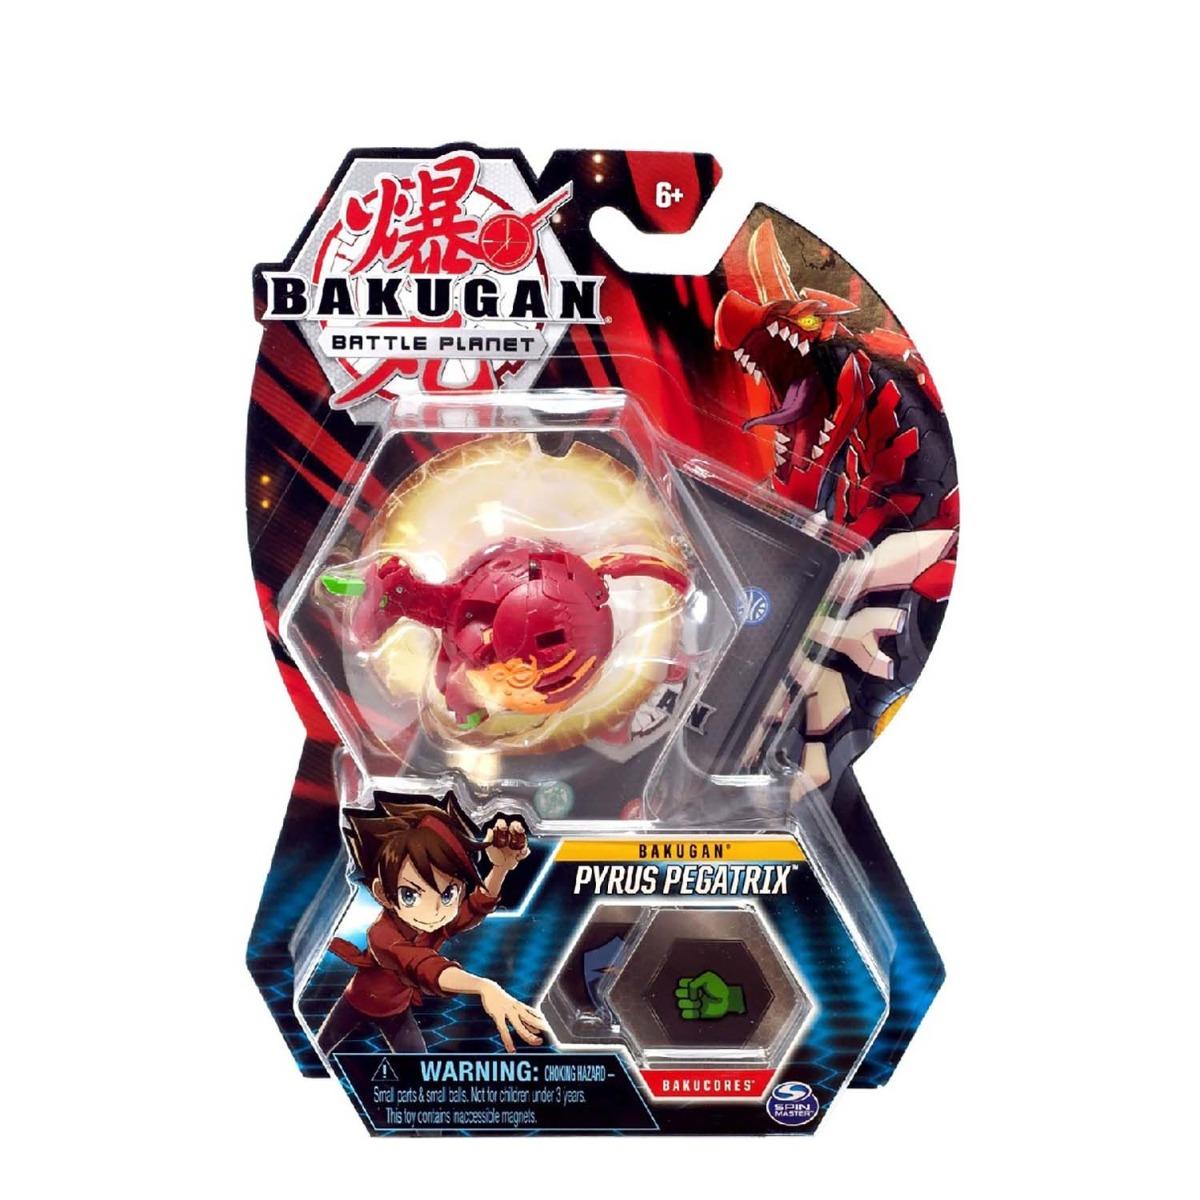 Figurina Bakugan Battle Planet, Pyrus Pegatrix, 20118446